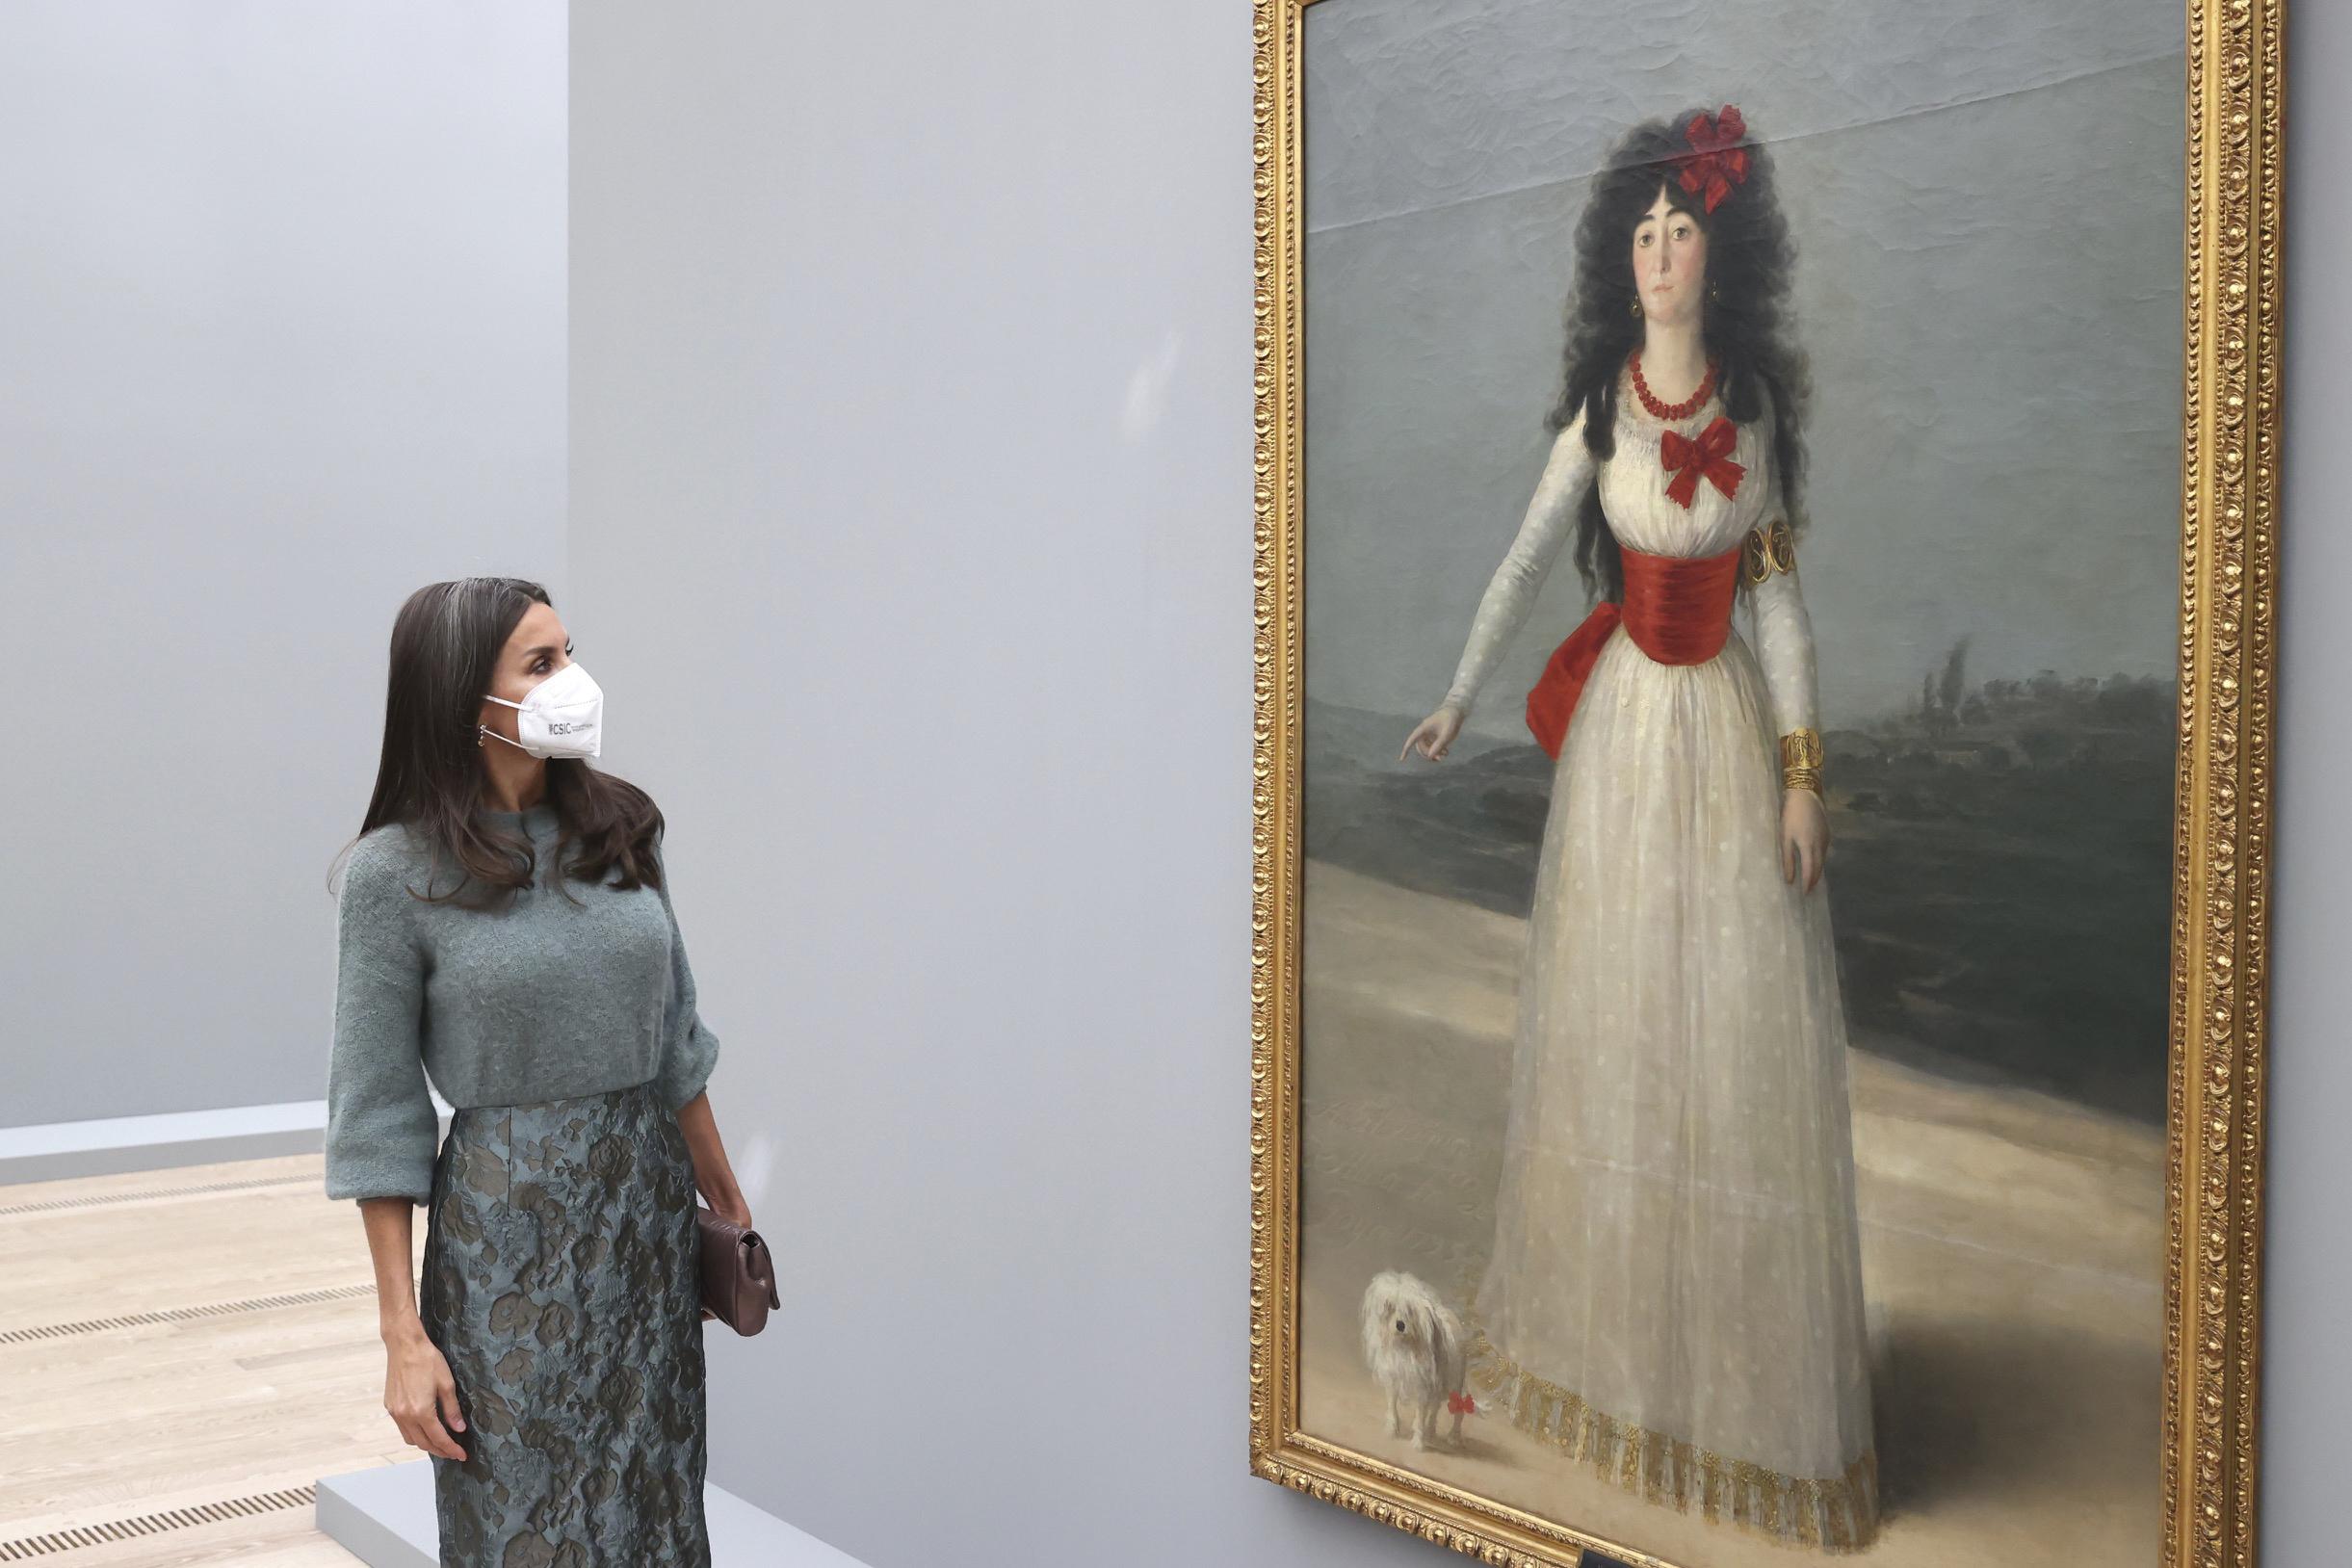 La reina Letizia contempla un retrato de Goya a la Duquesa de Alba.